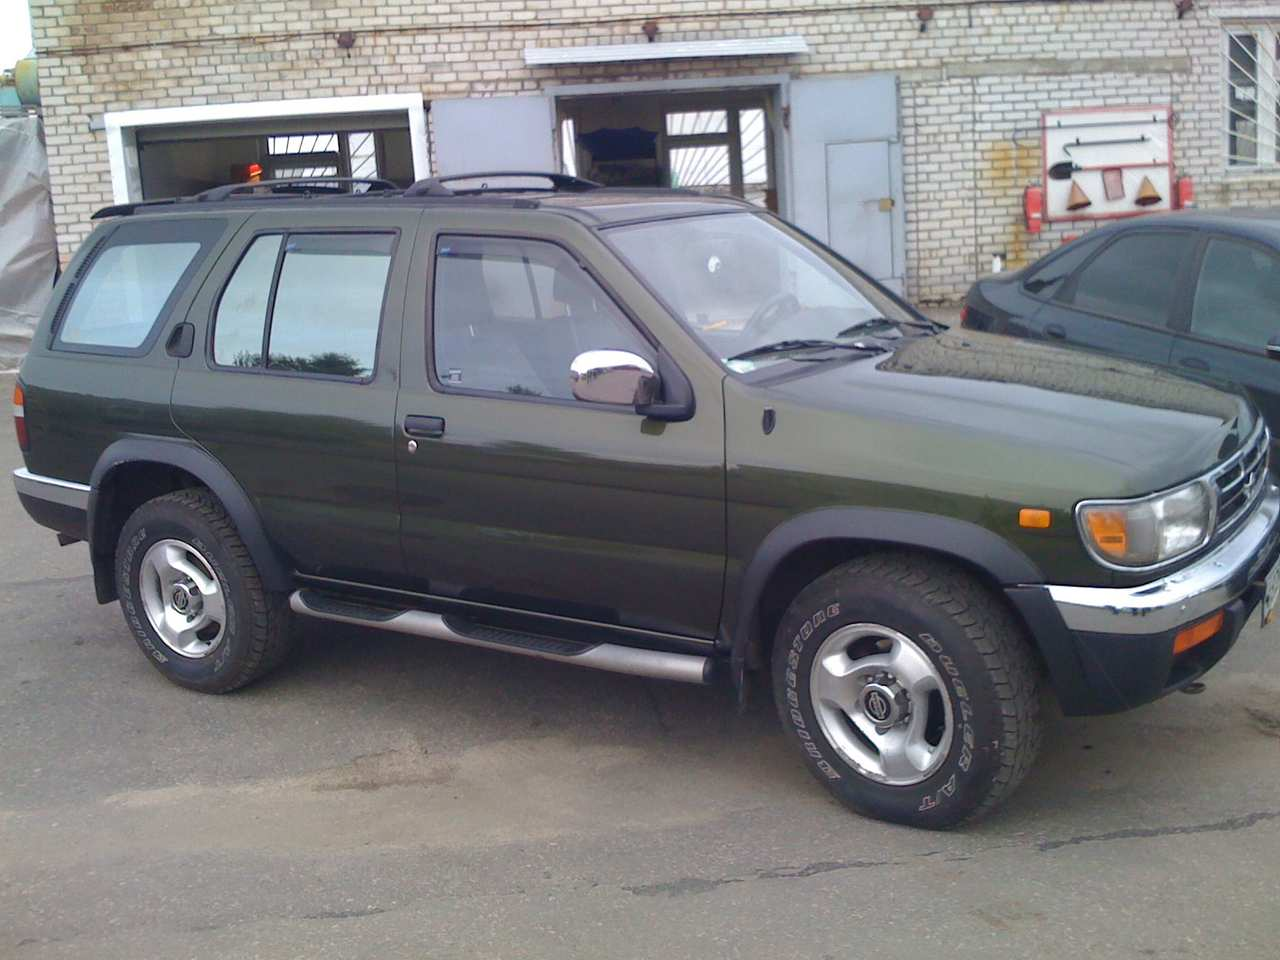 1999 Nissan Pathfinder Photos 3 0 Gasoline Automatic